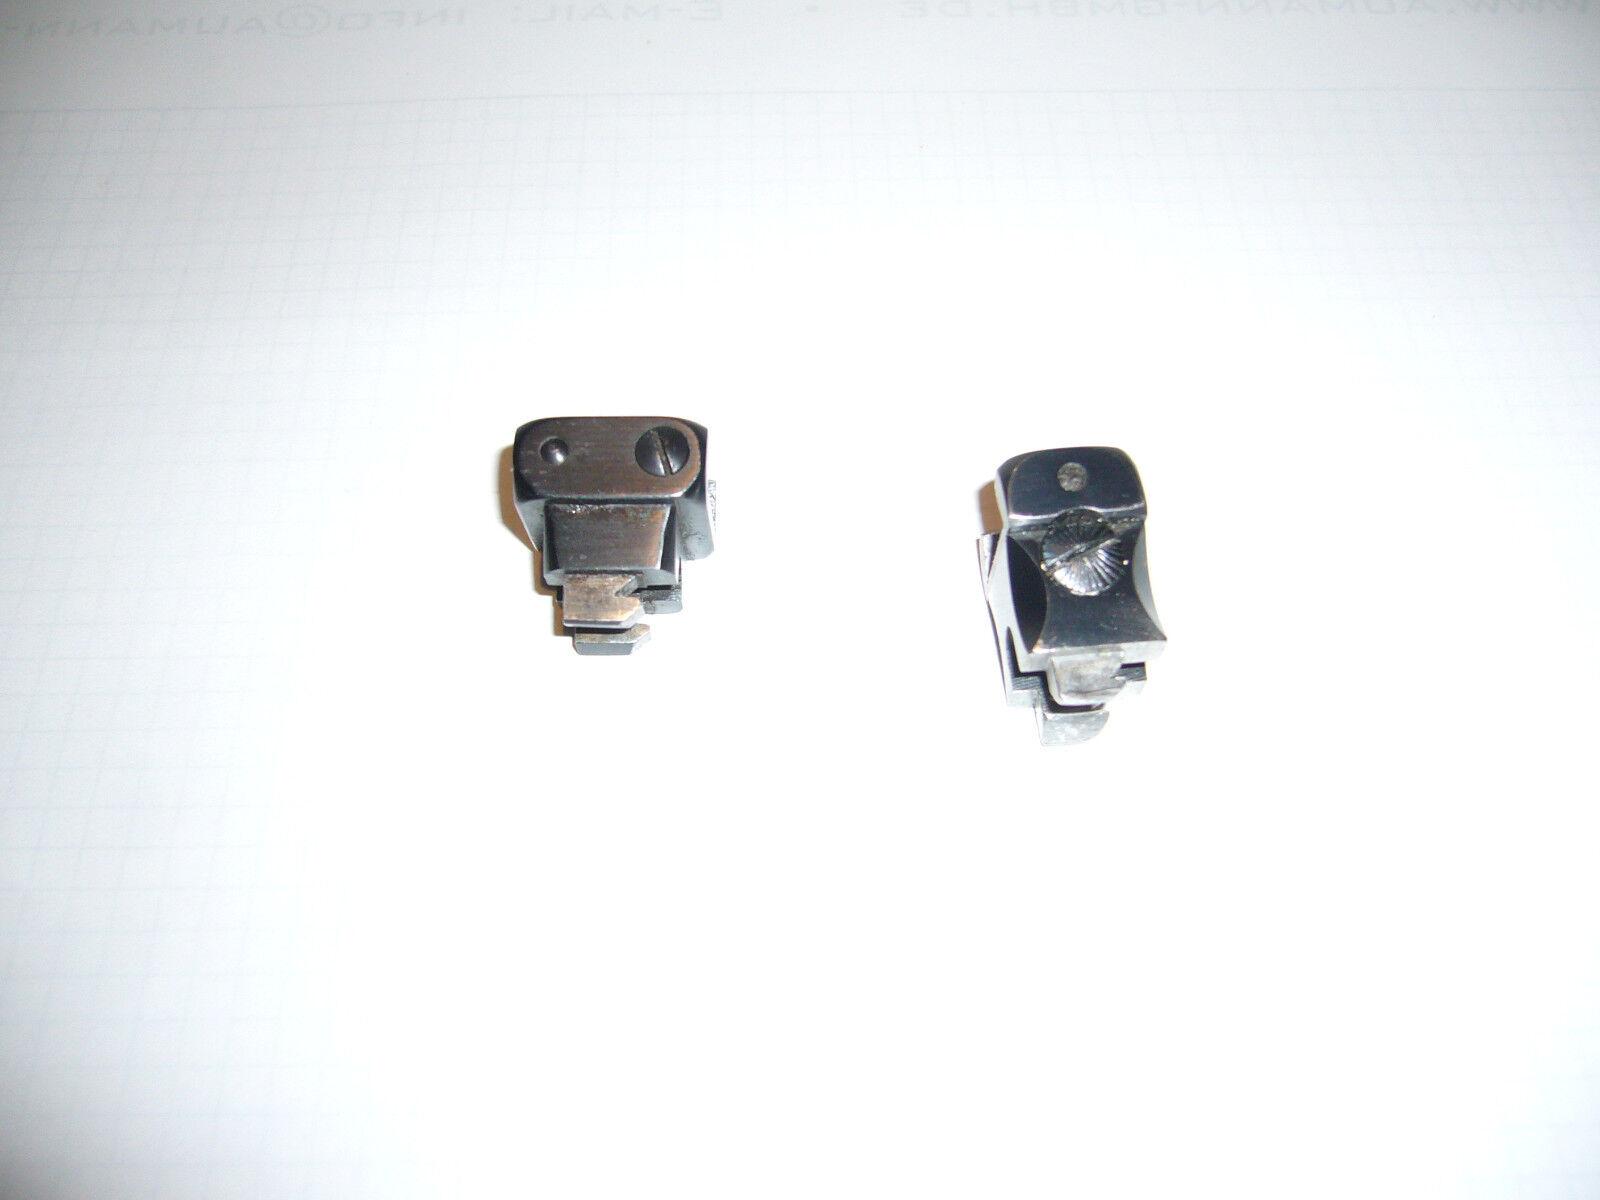 Sem montaje Zeiss Schmidt & Bender Swarovski 4x36 mira telescópica k-98 mosquetón